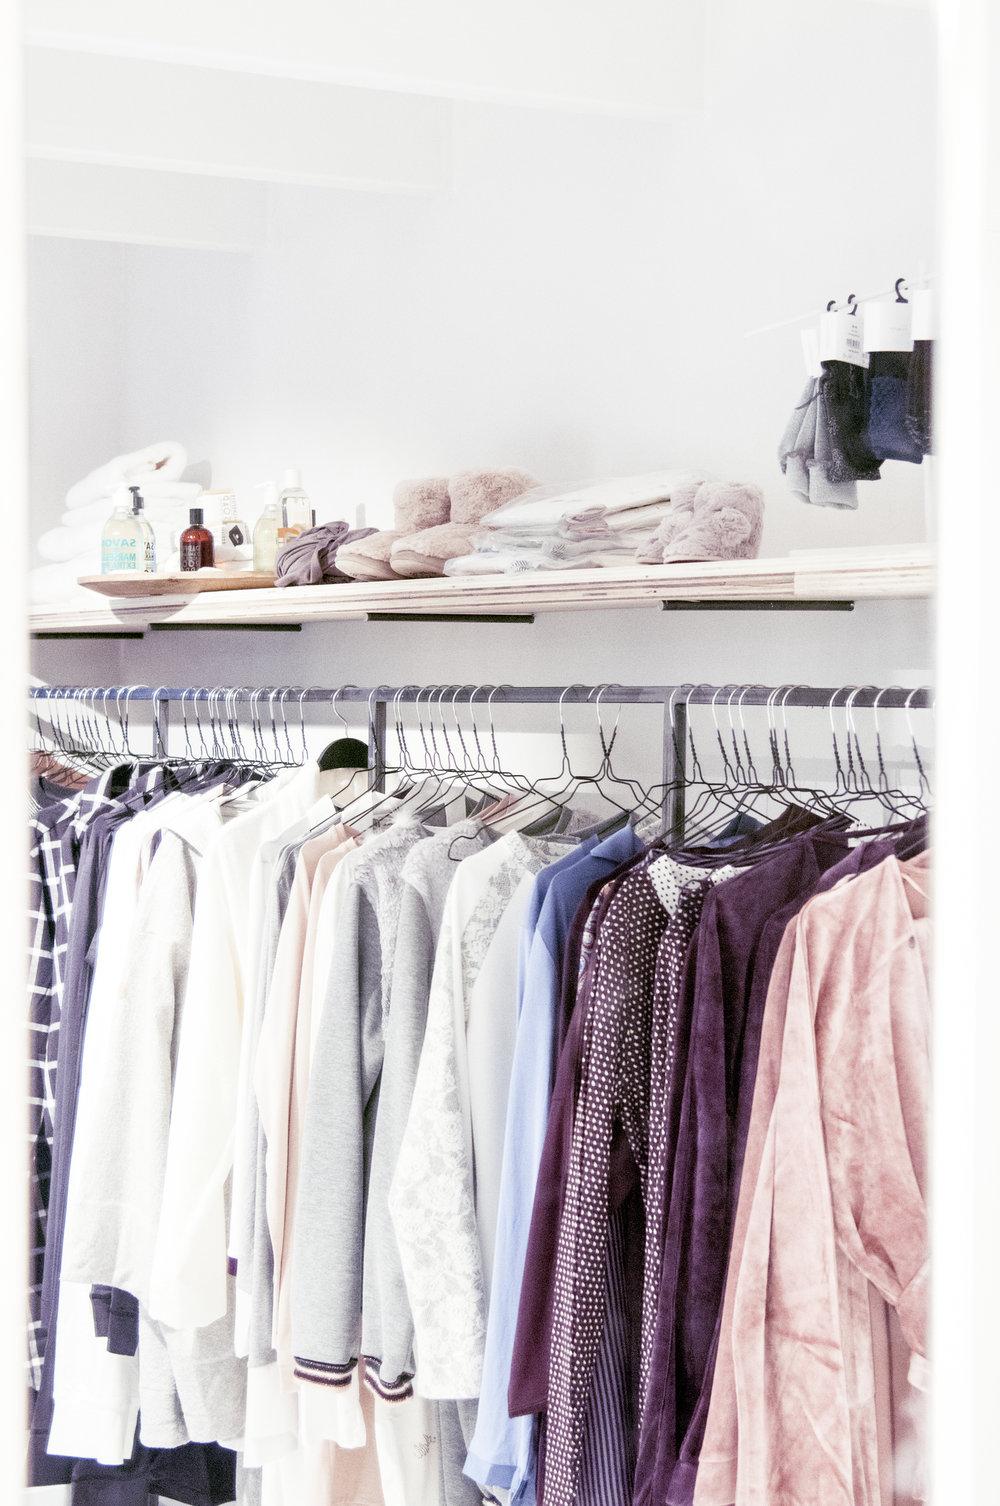 Cosi Casa collectie home:sleepwear.jpg